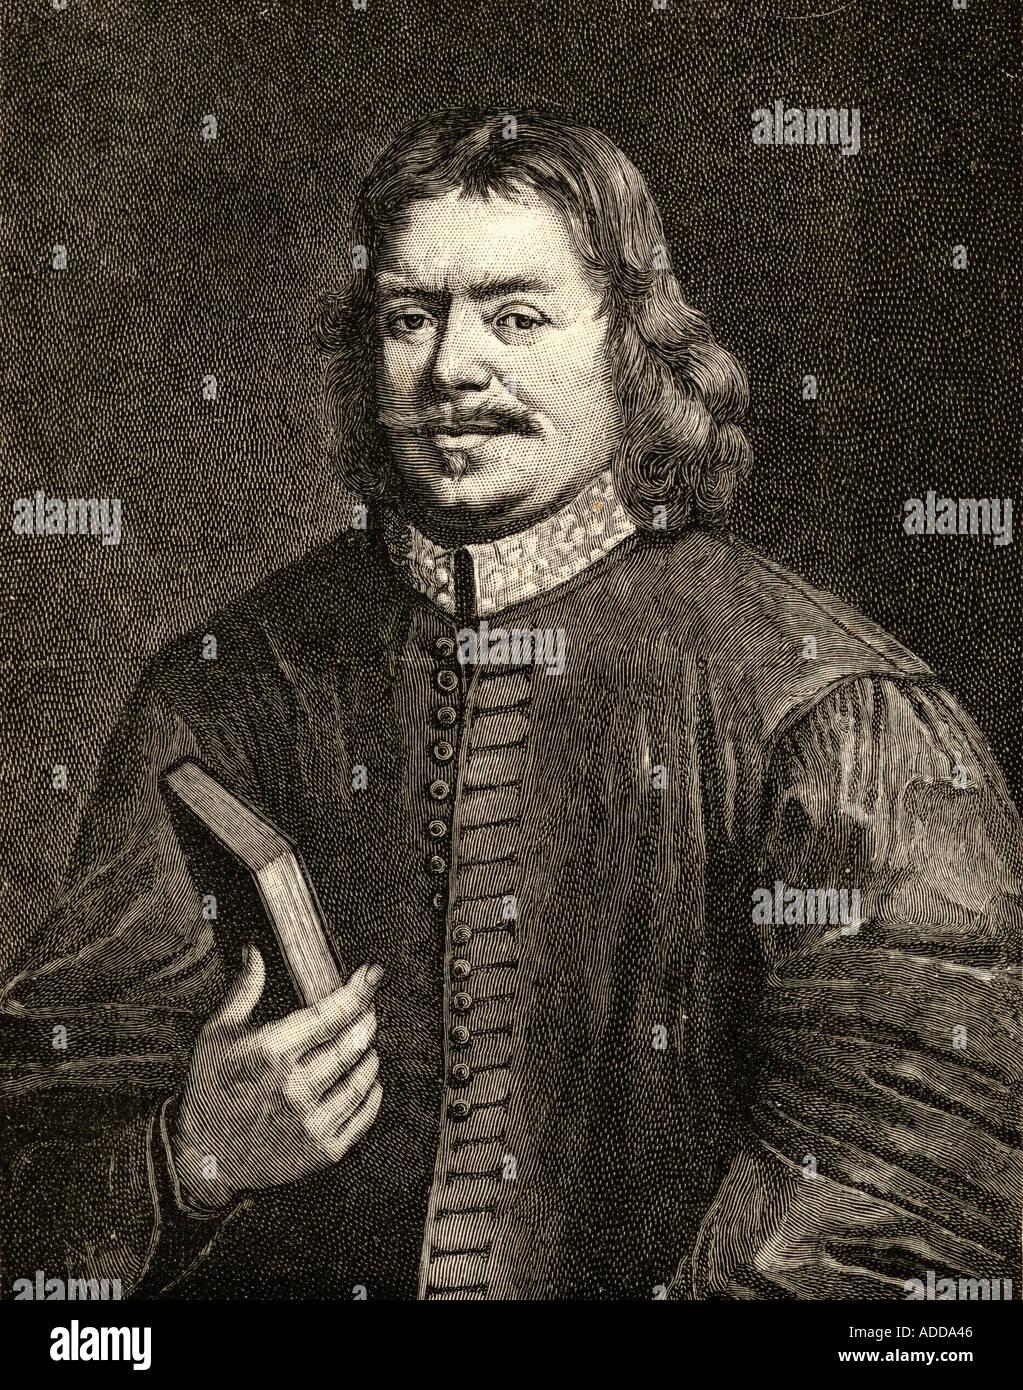 John Bunyan, 1628 -1688.  English writer and Puritan preacher. Author of The Pilgrim's Progress. Stock Photo